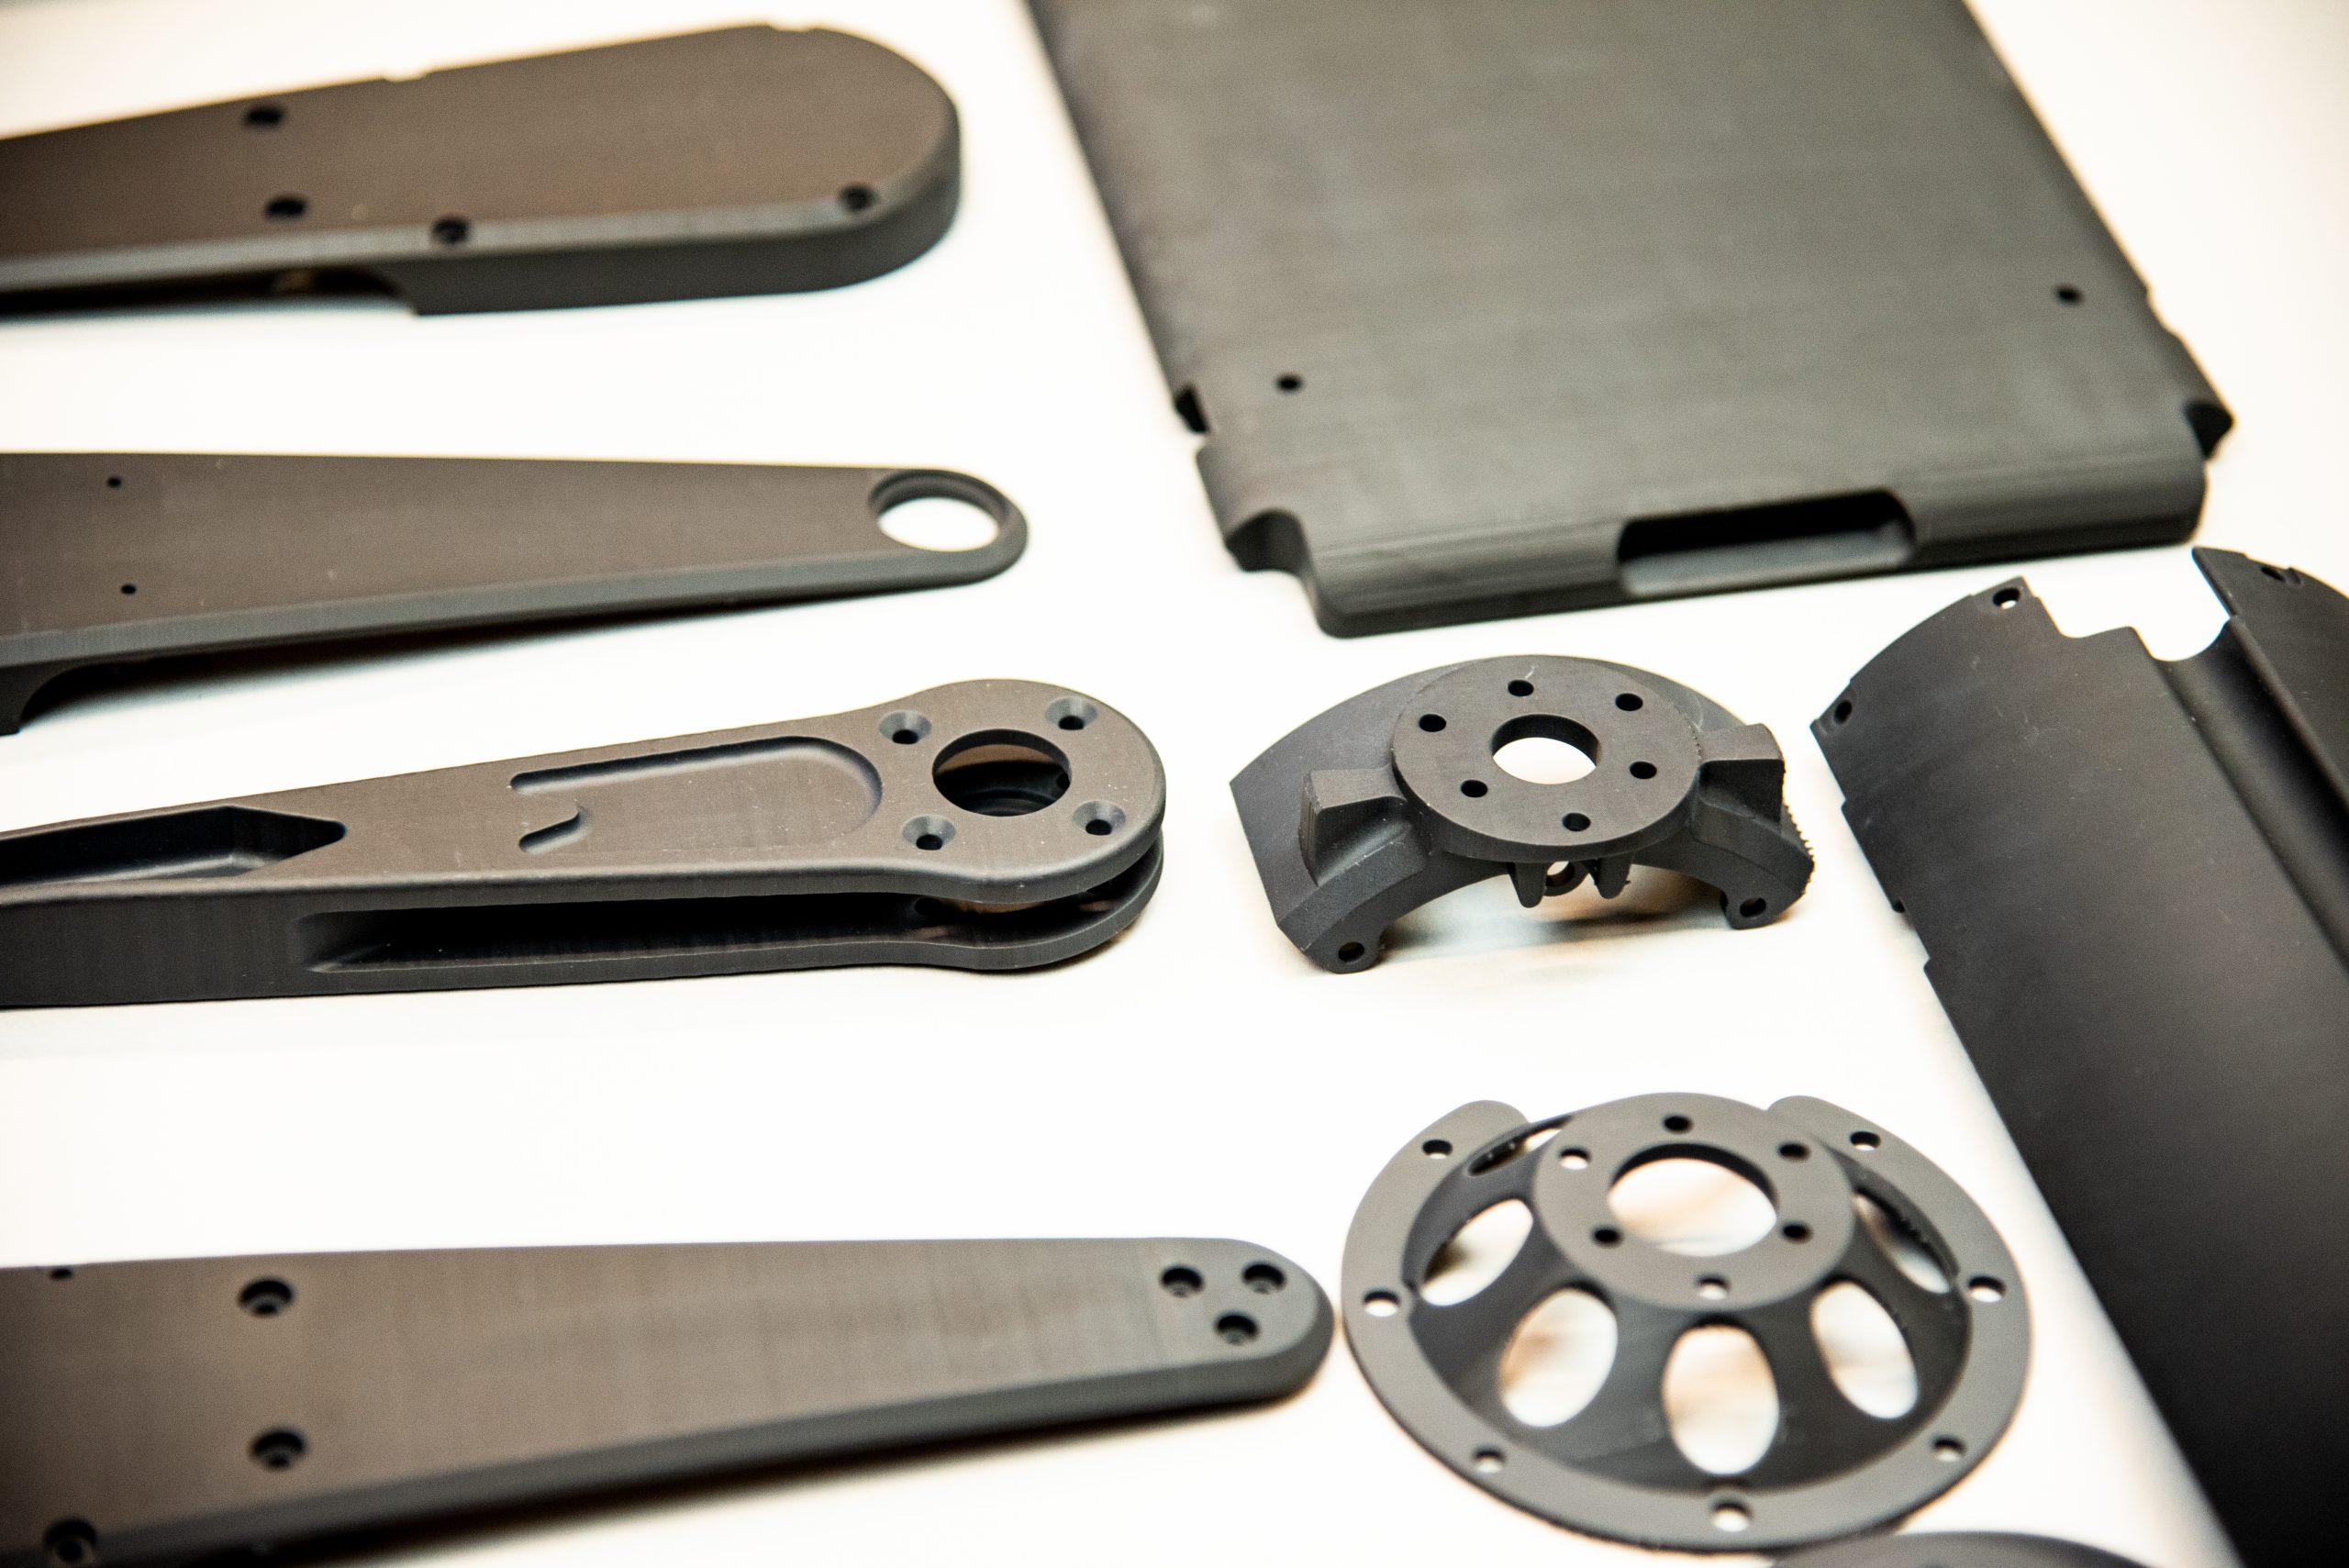 Robotics, applications, material for 3d printing